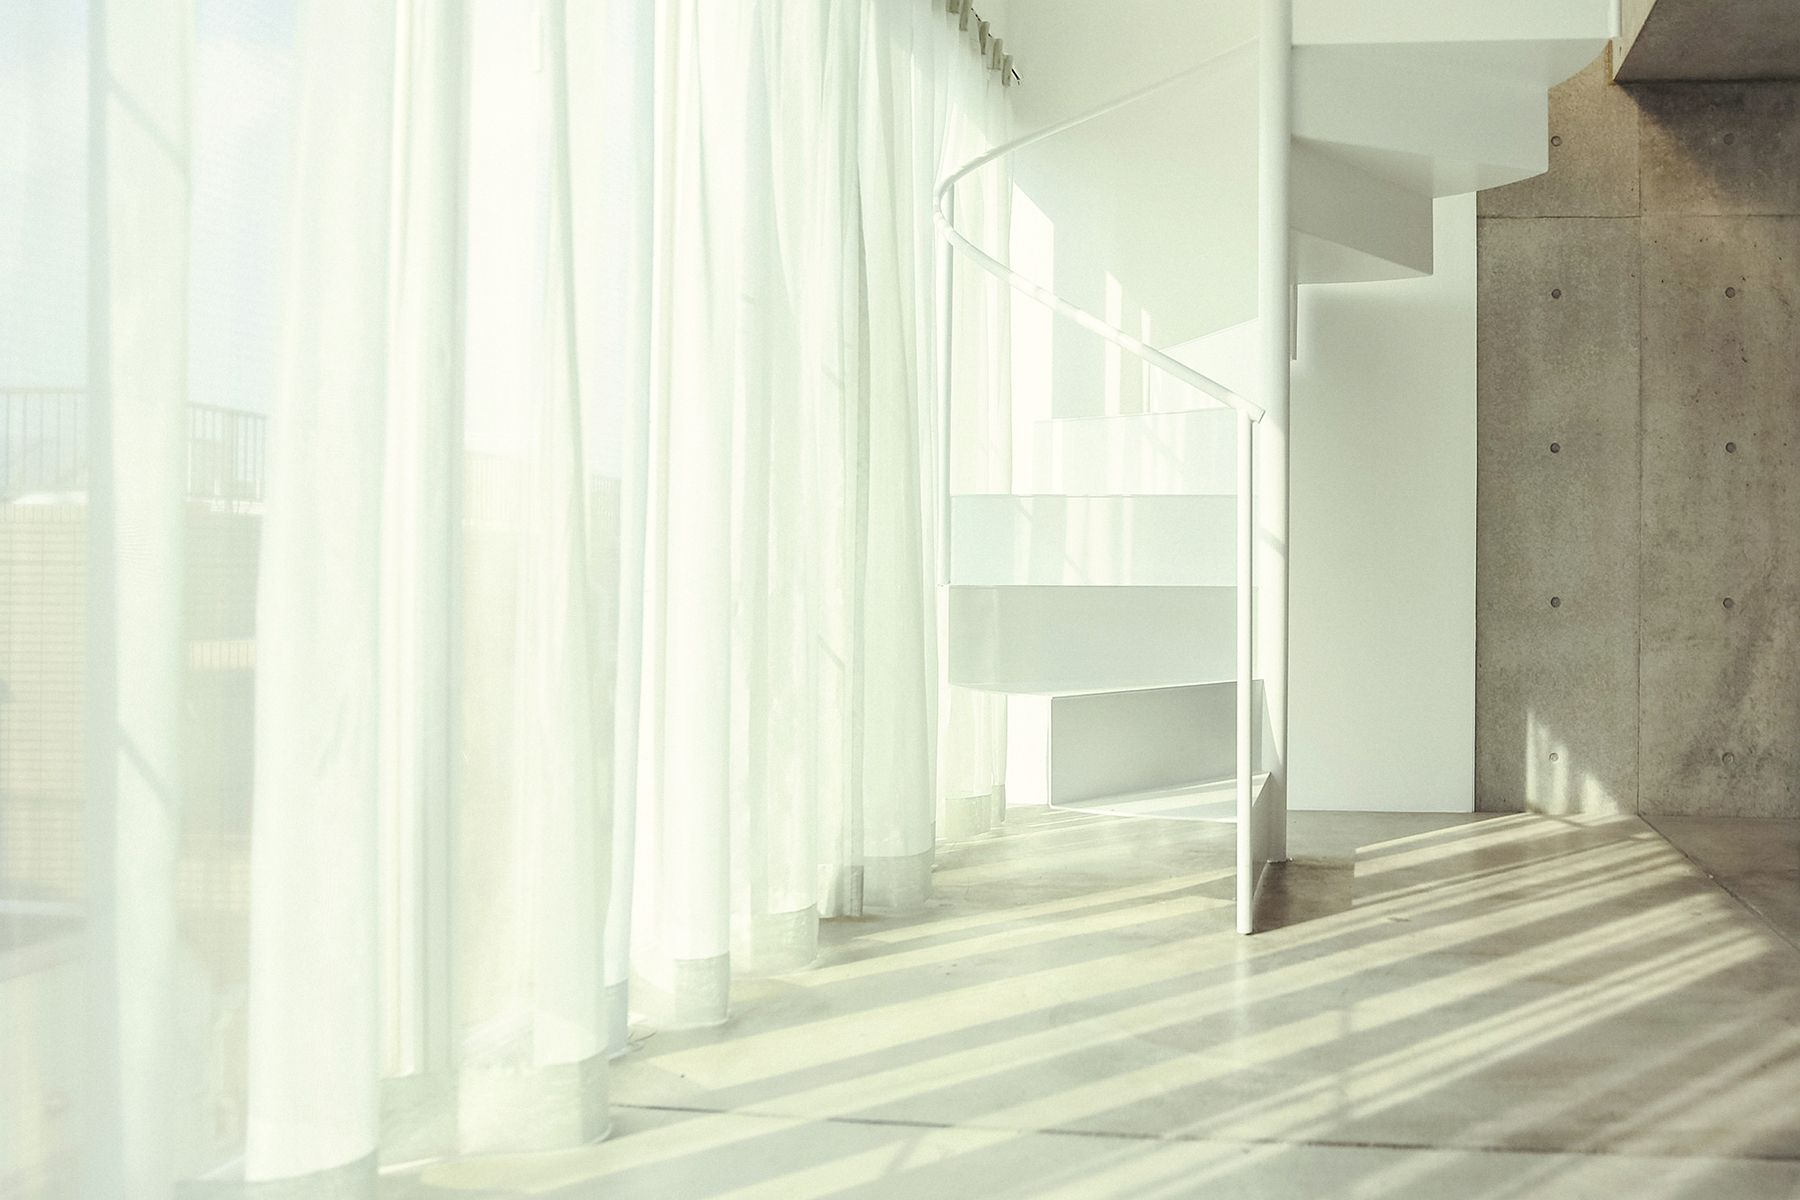 White Room (Pygmy Company) ホワイトルーム3F 螺旋階段